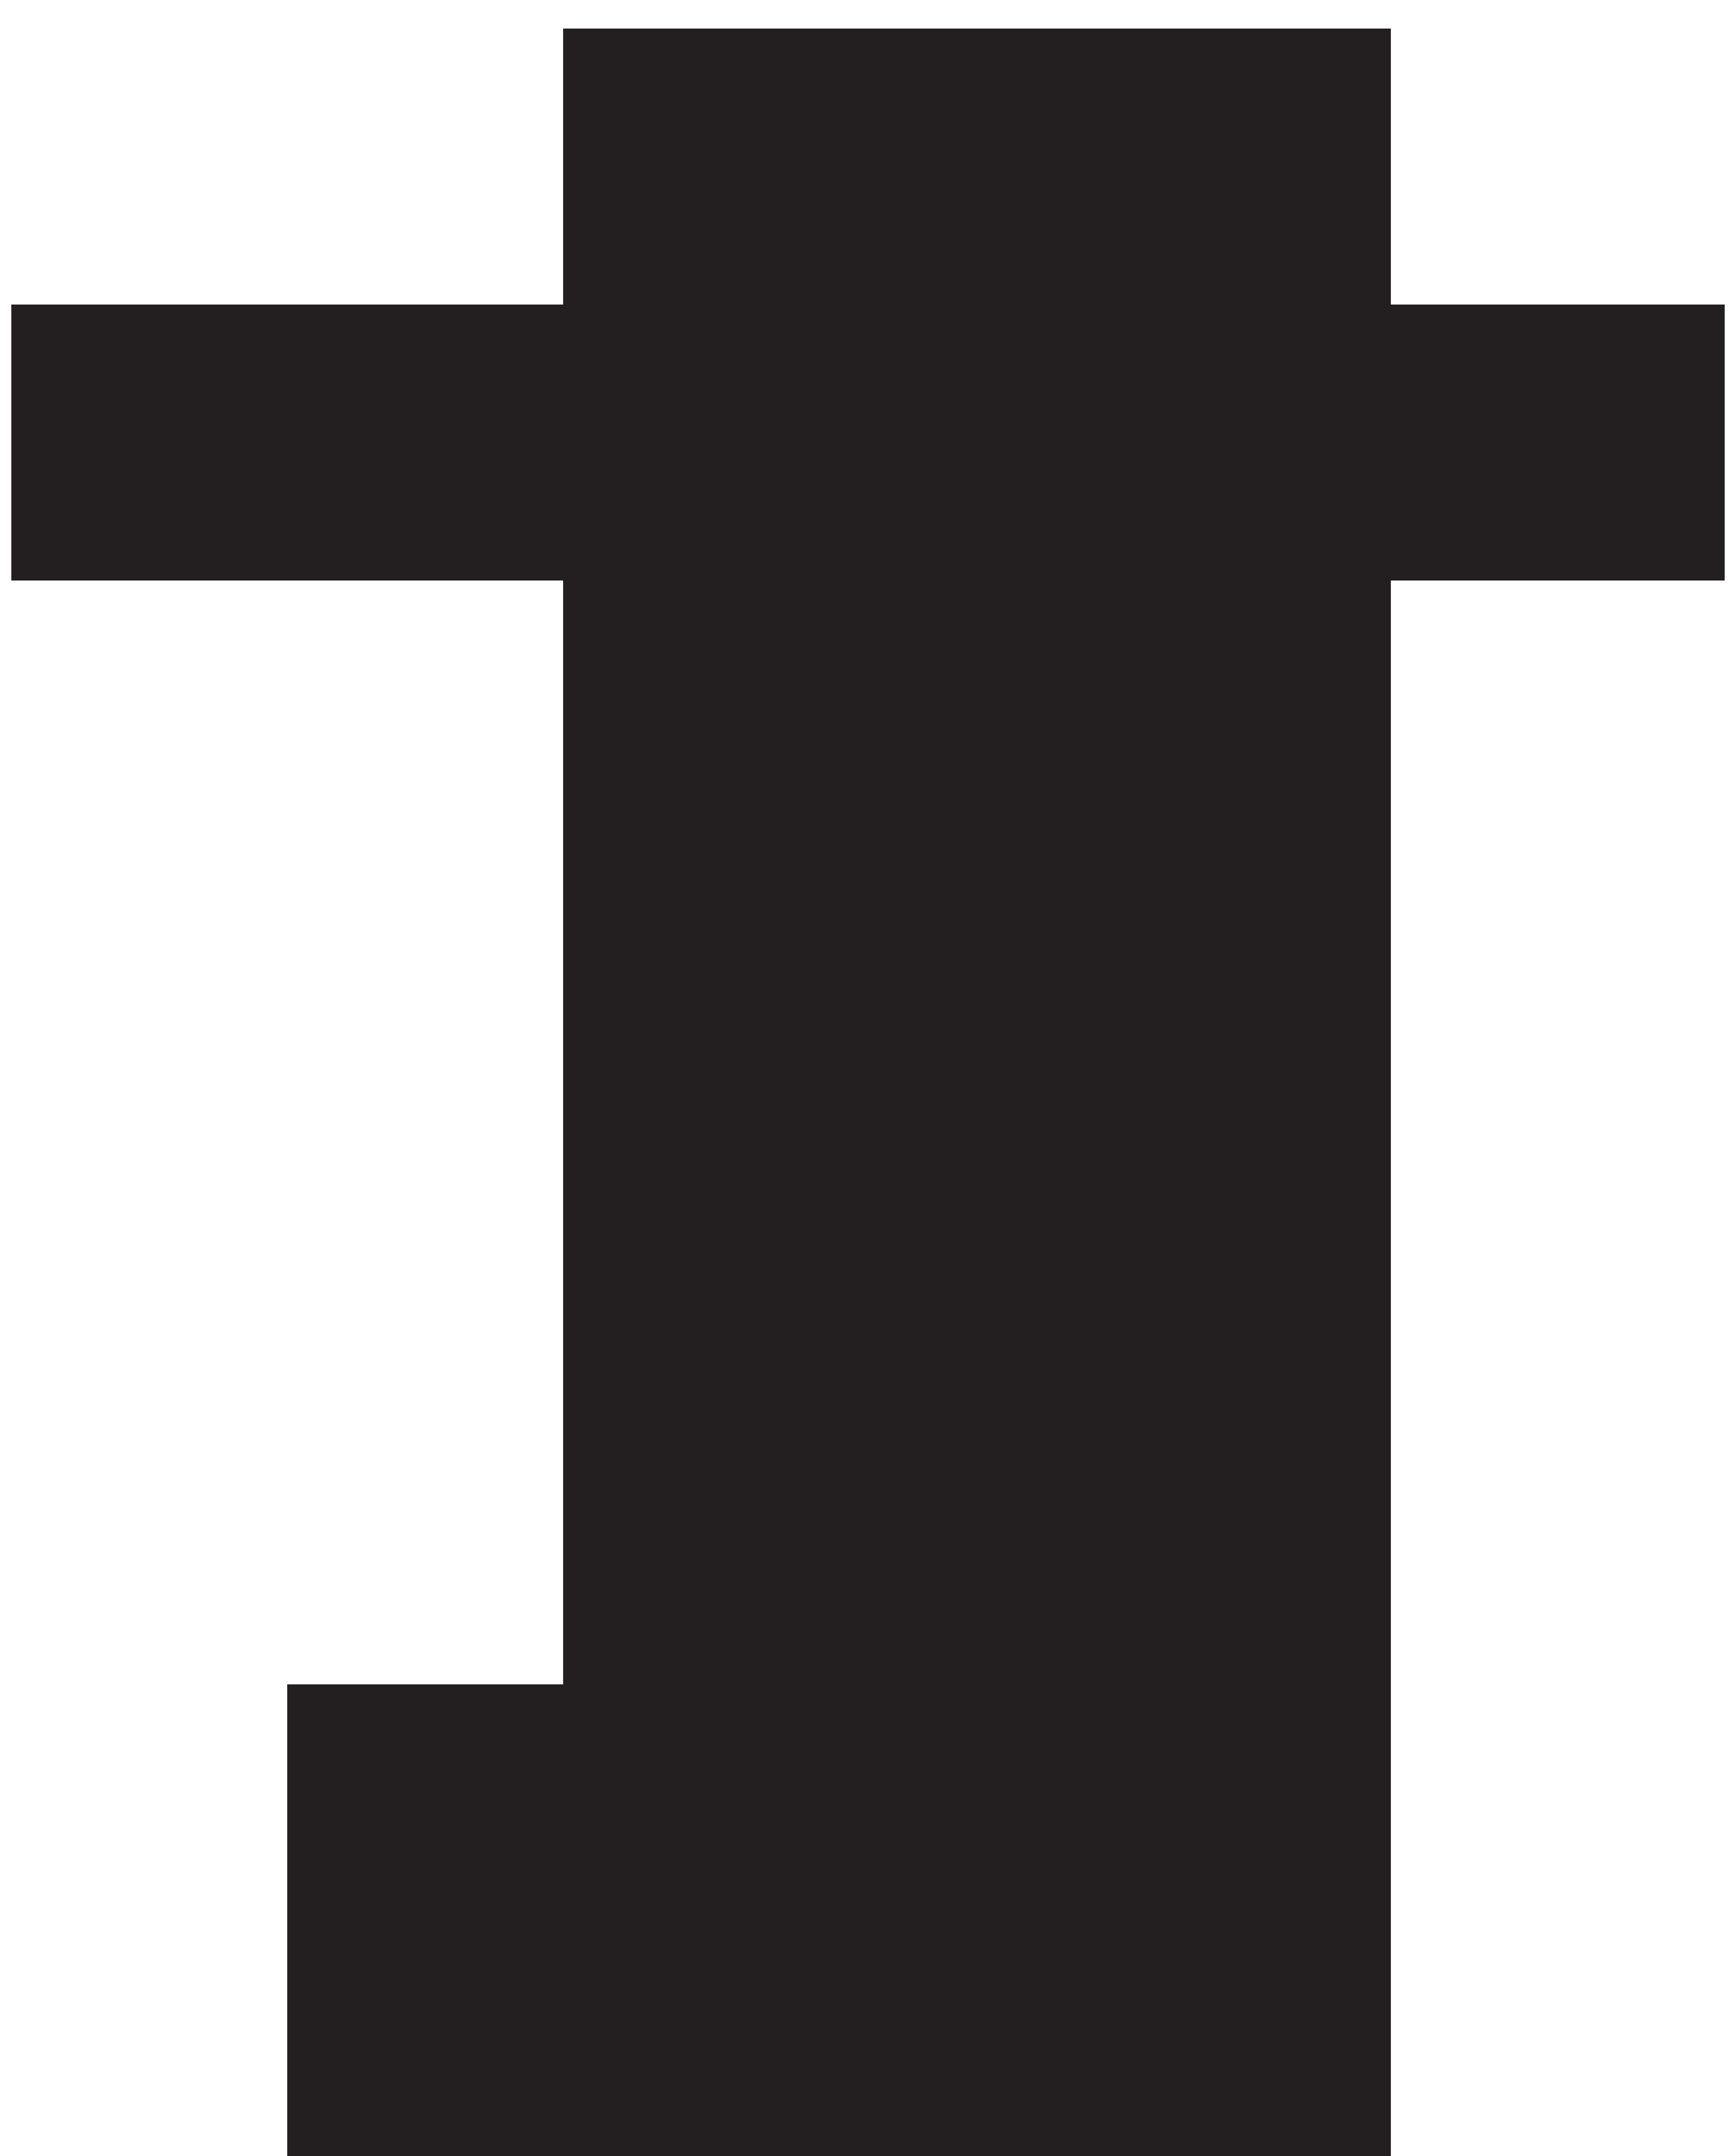 Crucifix clipart watercolor. Jesus christ statue silhouette